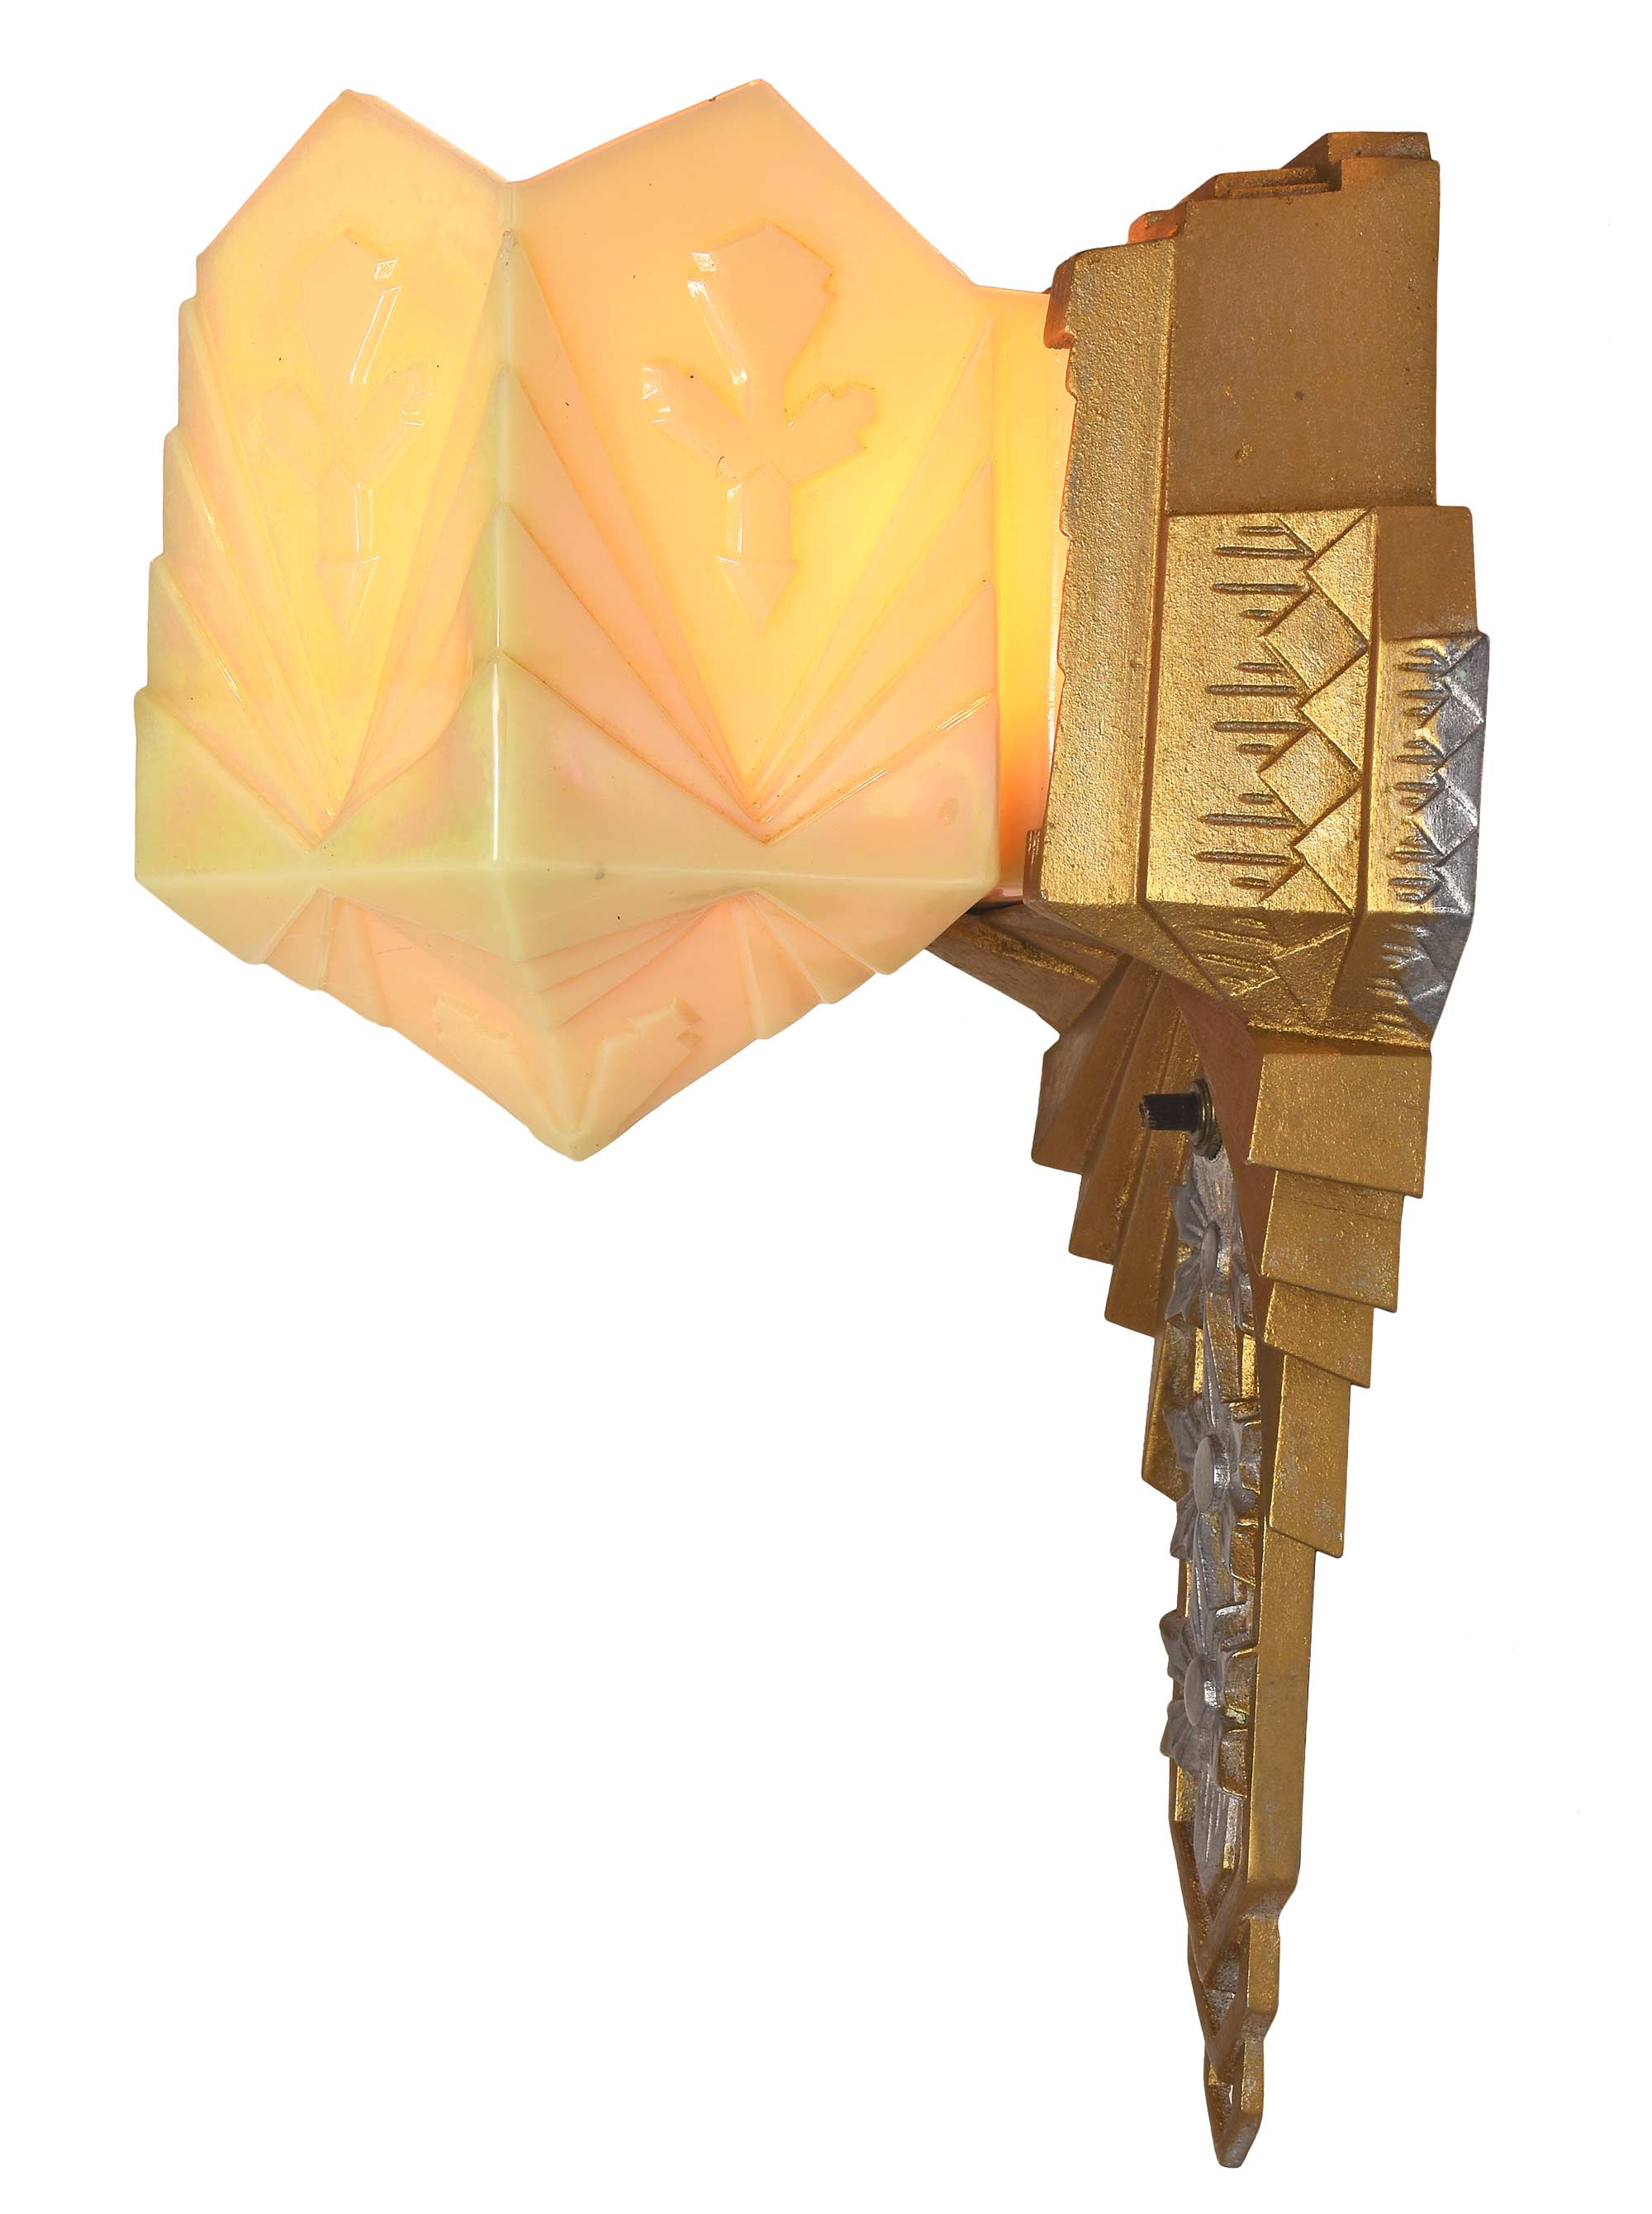 46651-art-deco-sconce-with-molded-custard-glass-lit.jpg